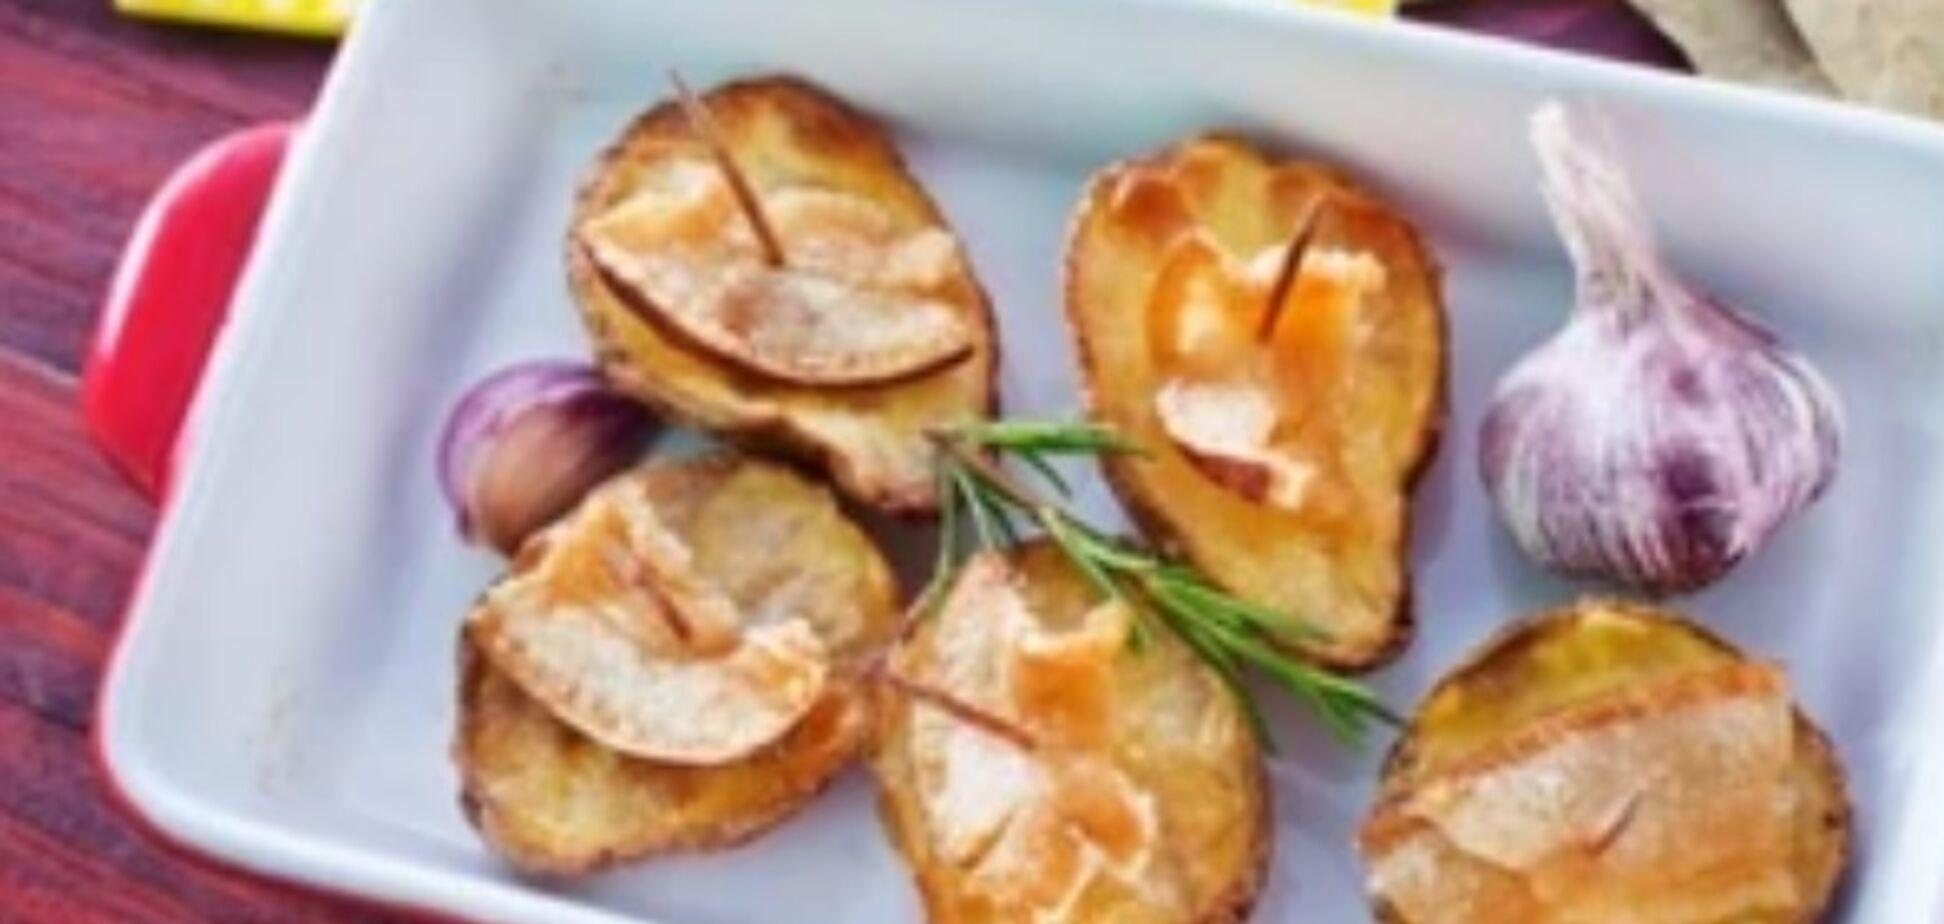 Рецепт дуже смачної печеної картоплі